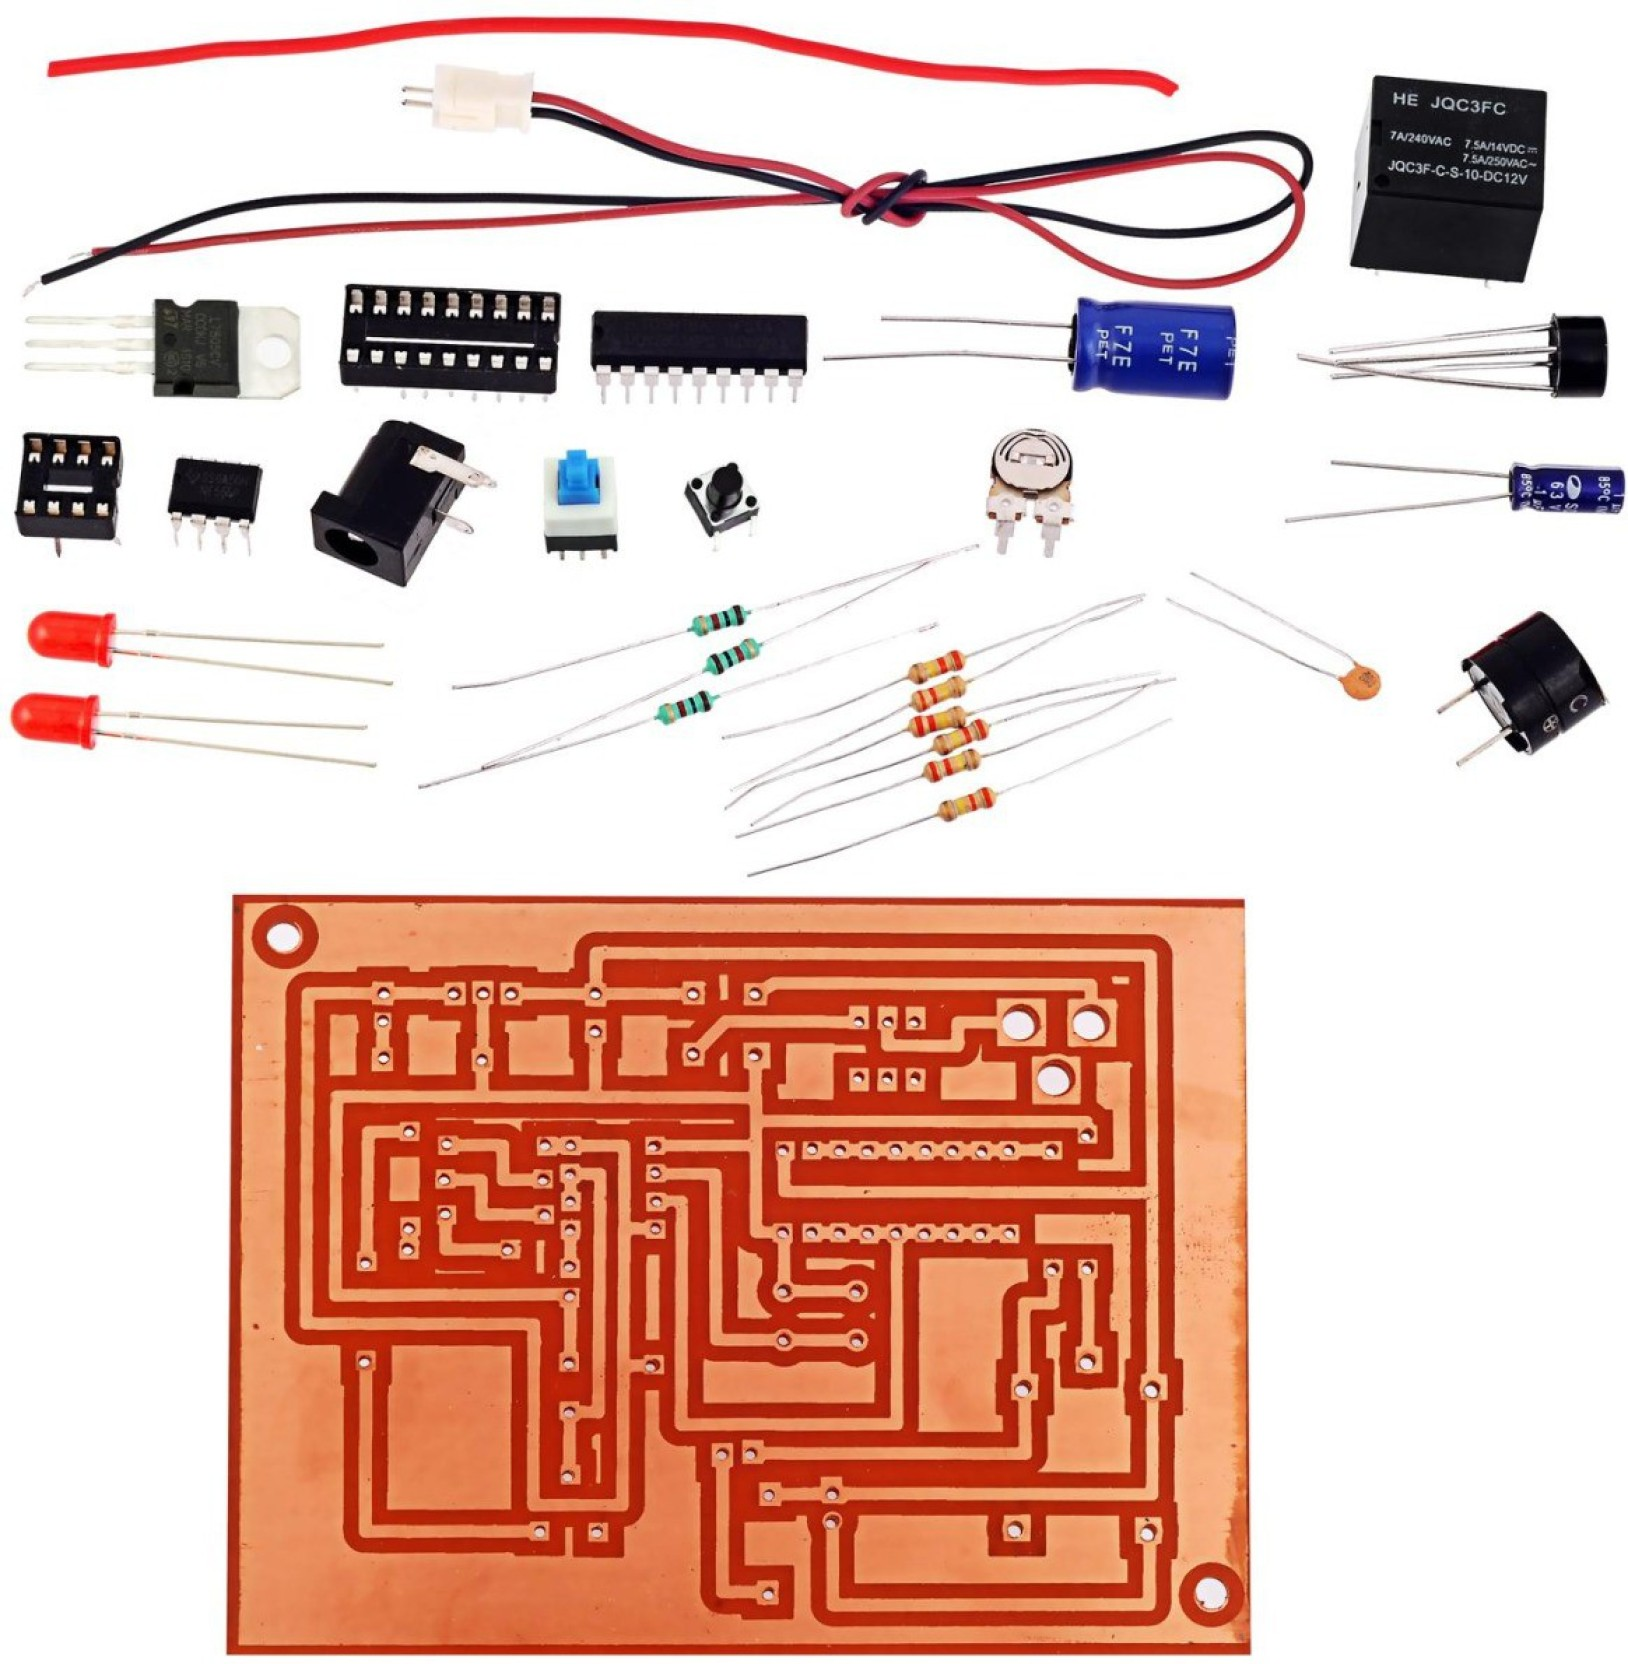 Kitsguru School Bell Alarm Lgkt034 Educational Electronic Hobby Kit Circuit Add To Cart